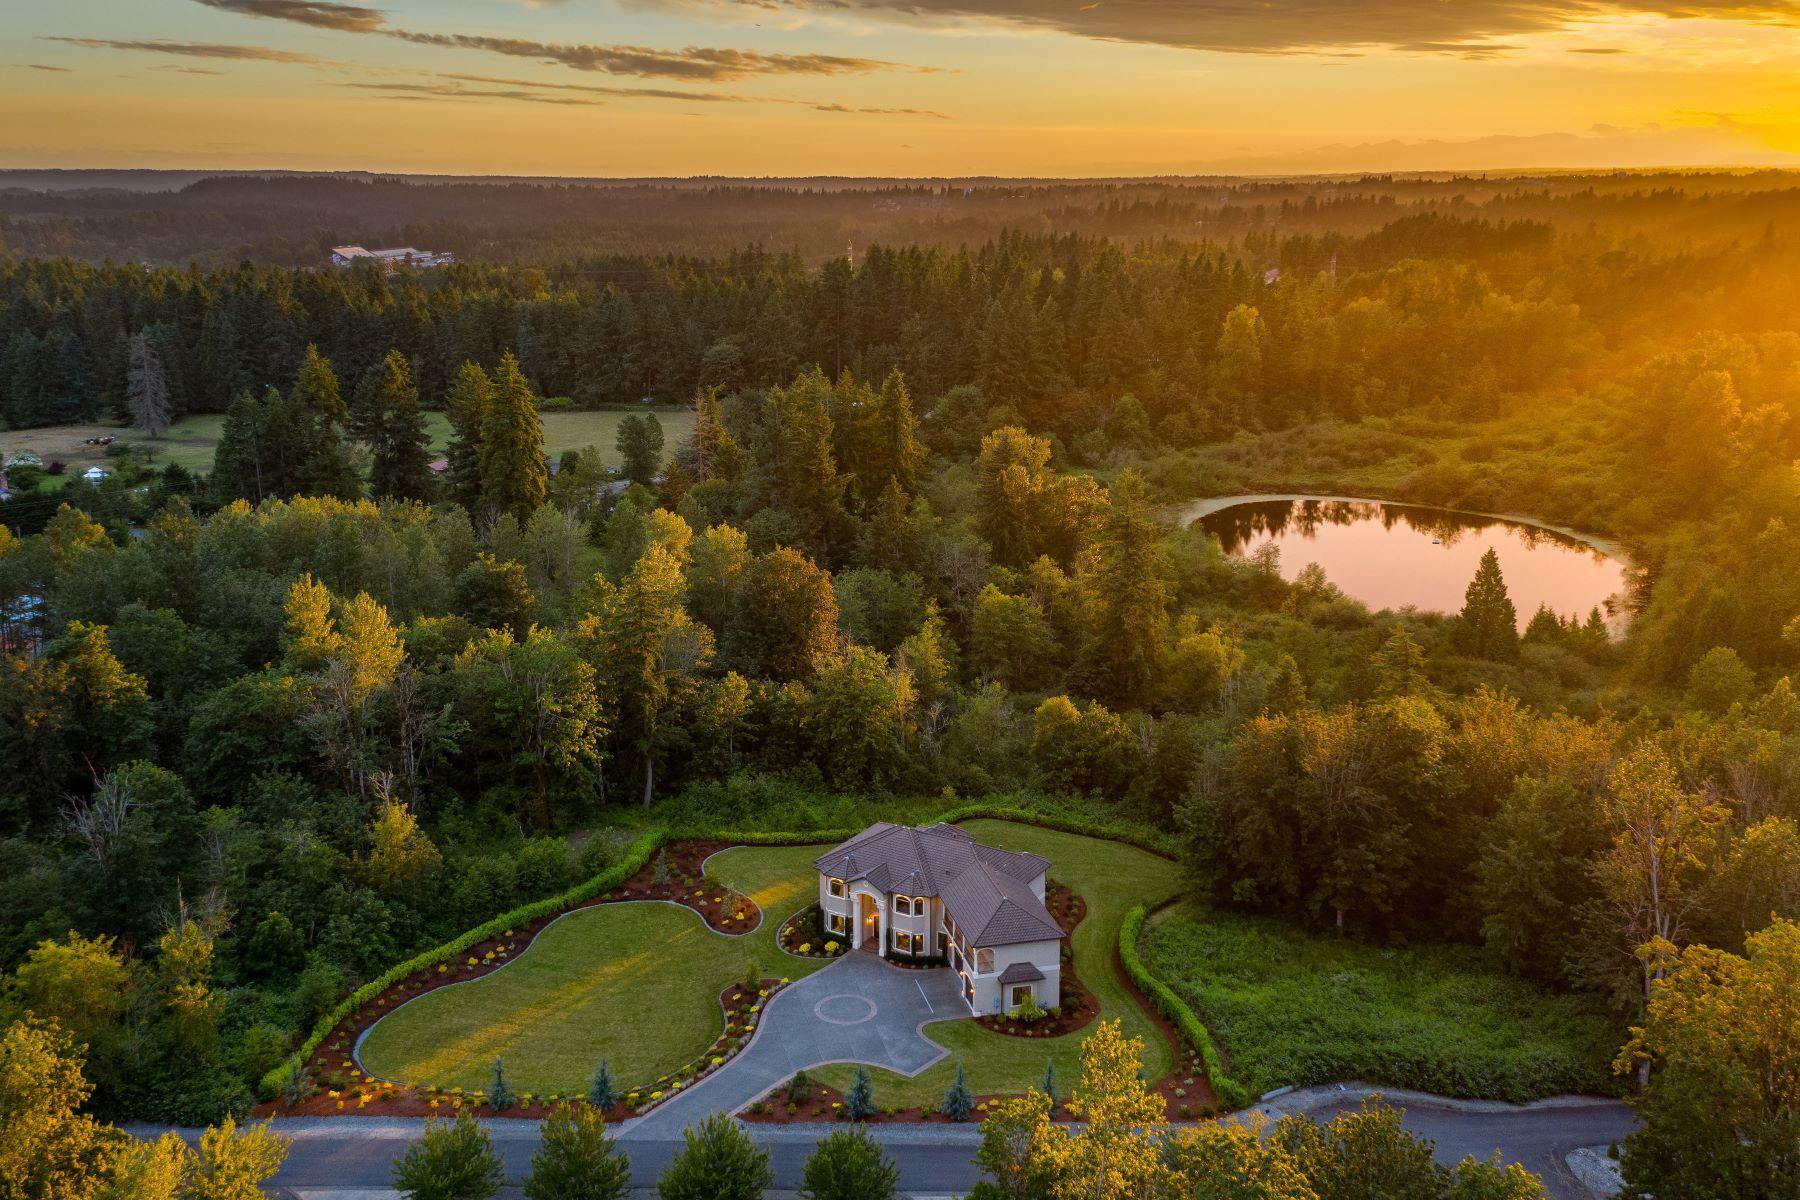 Single Family Homes for Sale at 30639 173rd Place Southeast, Auburn, WA 98092 30639 173rd Place SE Auburn, Washington 98092 United States